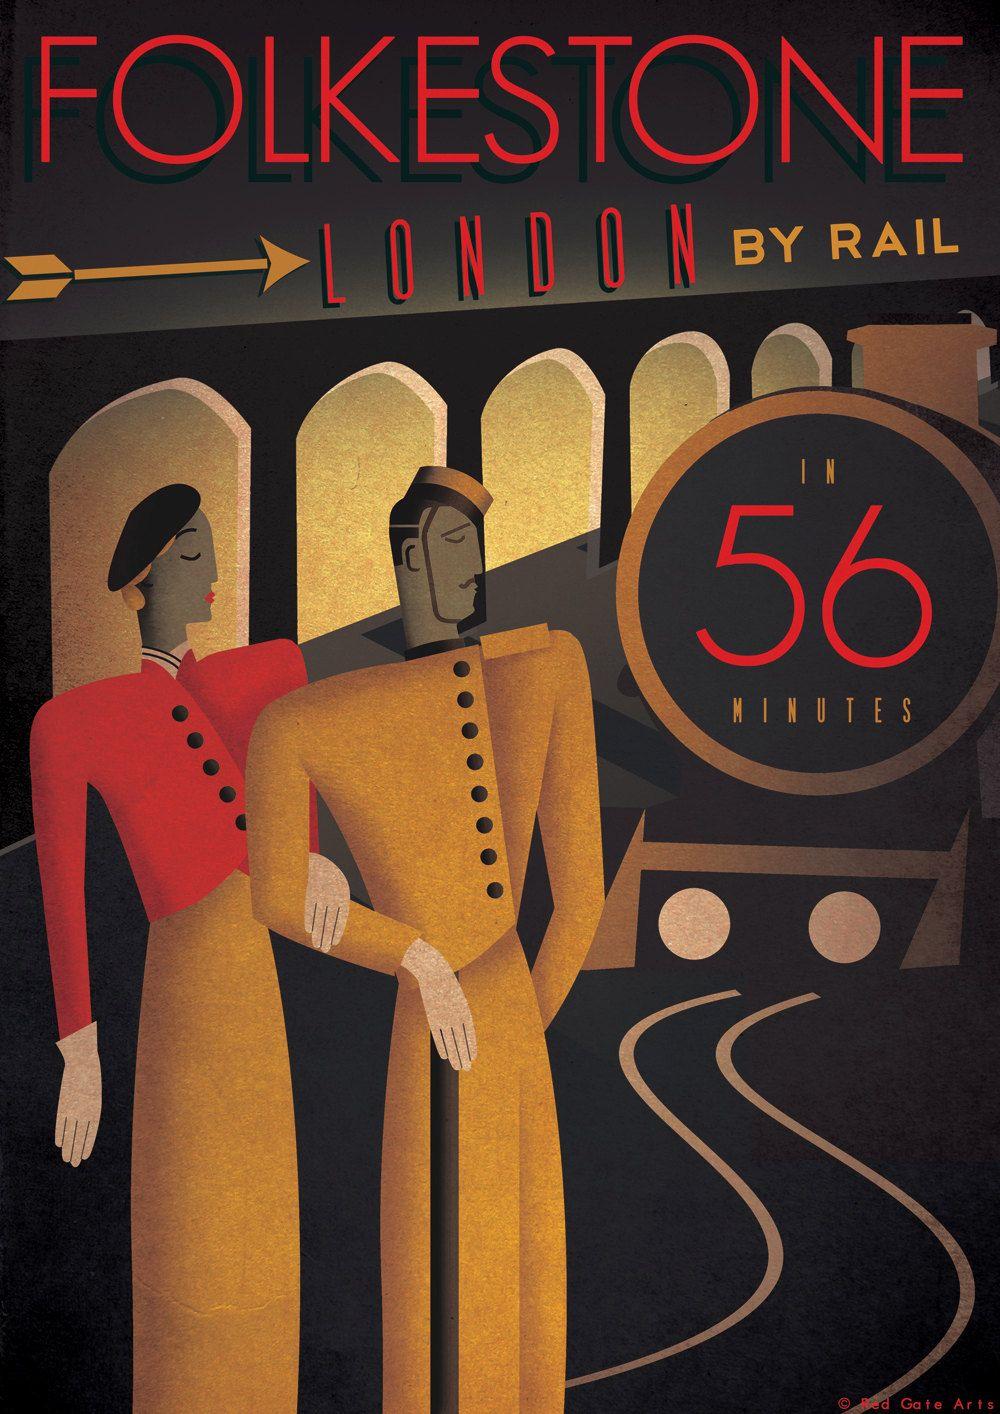 Poster design jobs london - Original Design Art Deco Bauhaus A3 Poster Print Vintage Railway Train Travel 1930 S Folkestone London